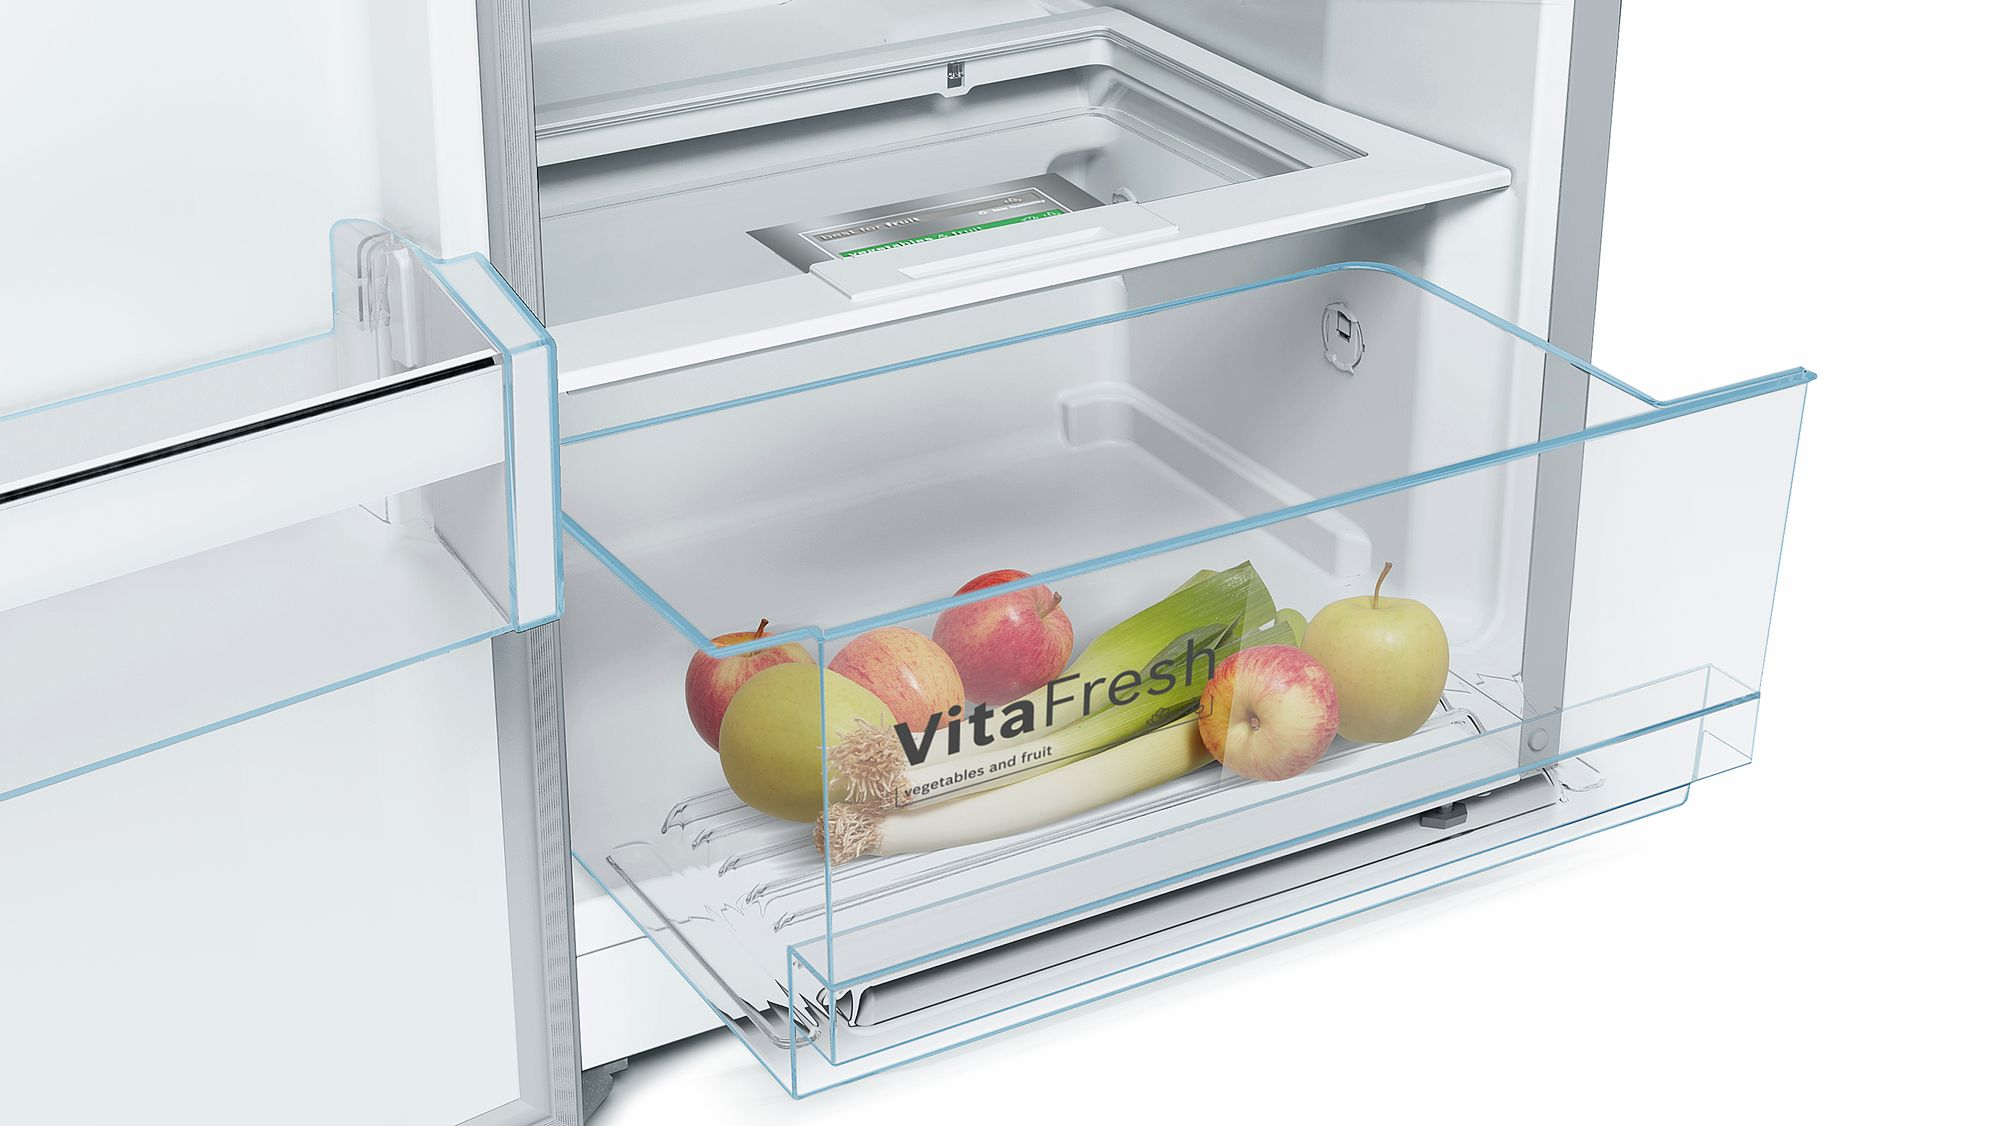 Bosch Kühlschrank Innen : Bosch stand kühlschrank türen edelstahl optik ksv vl p psi